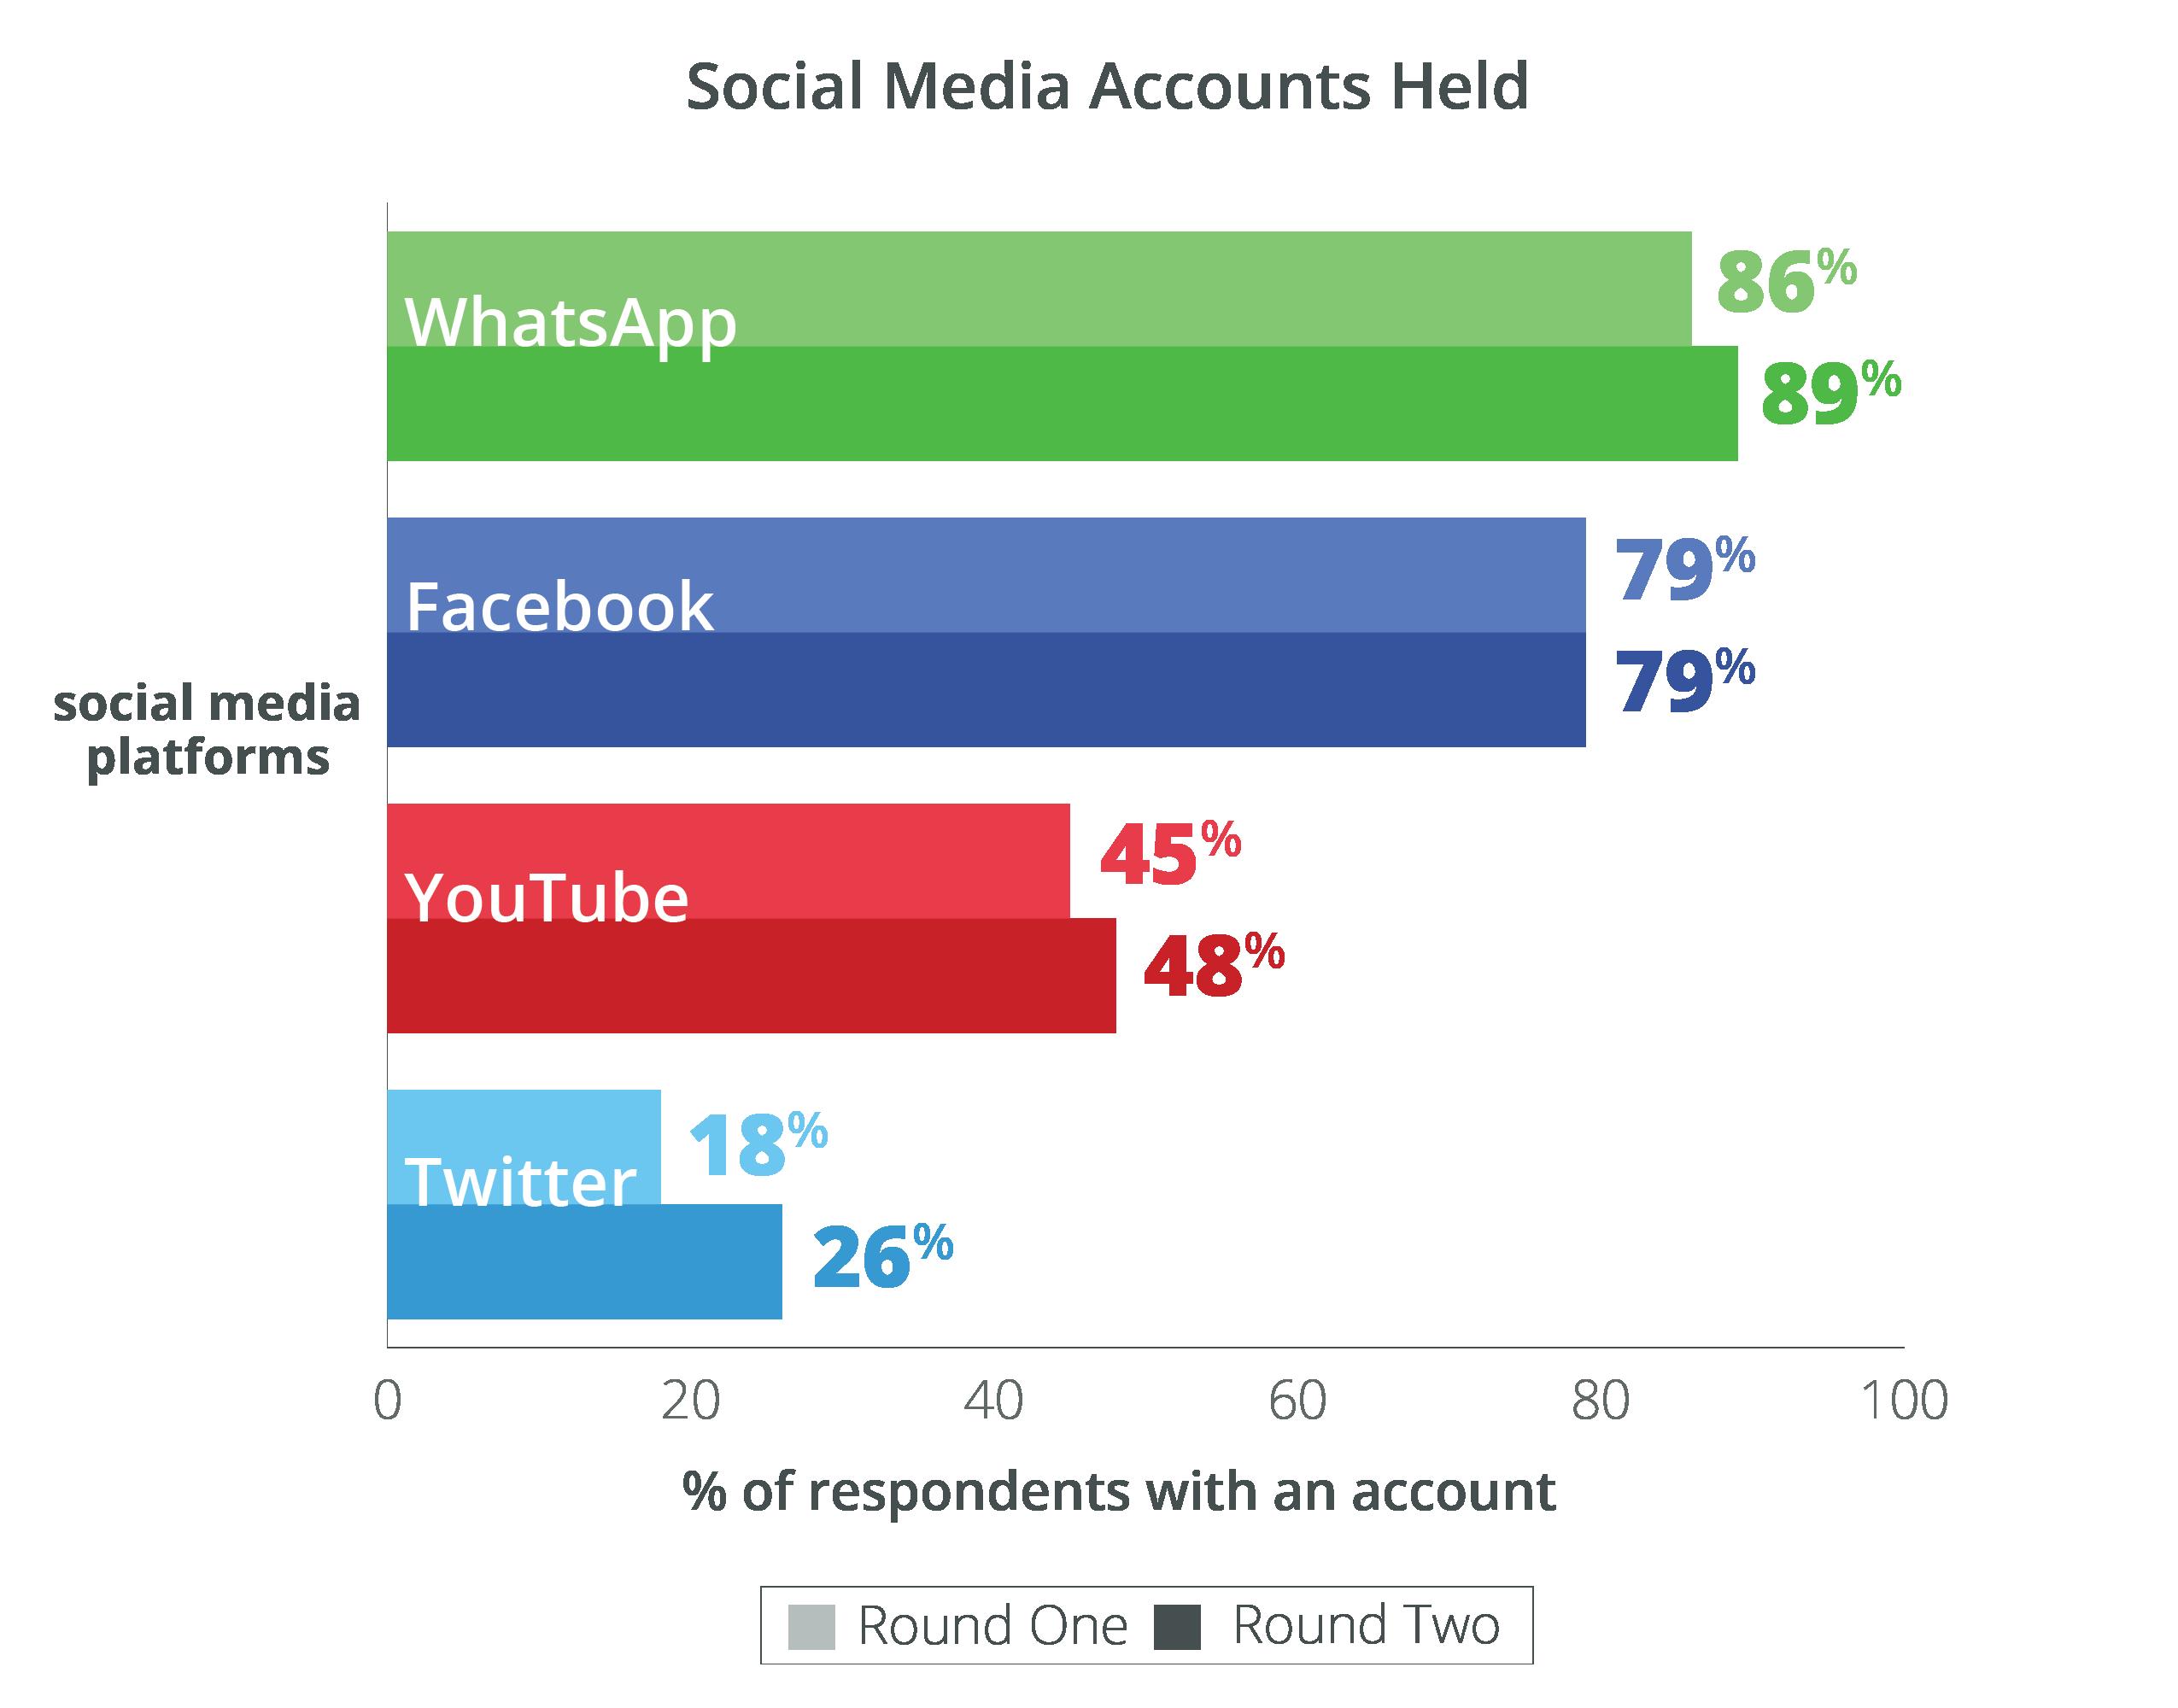 social-media-accounts-held-01